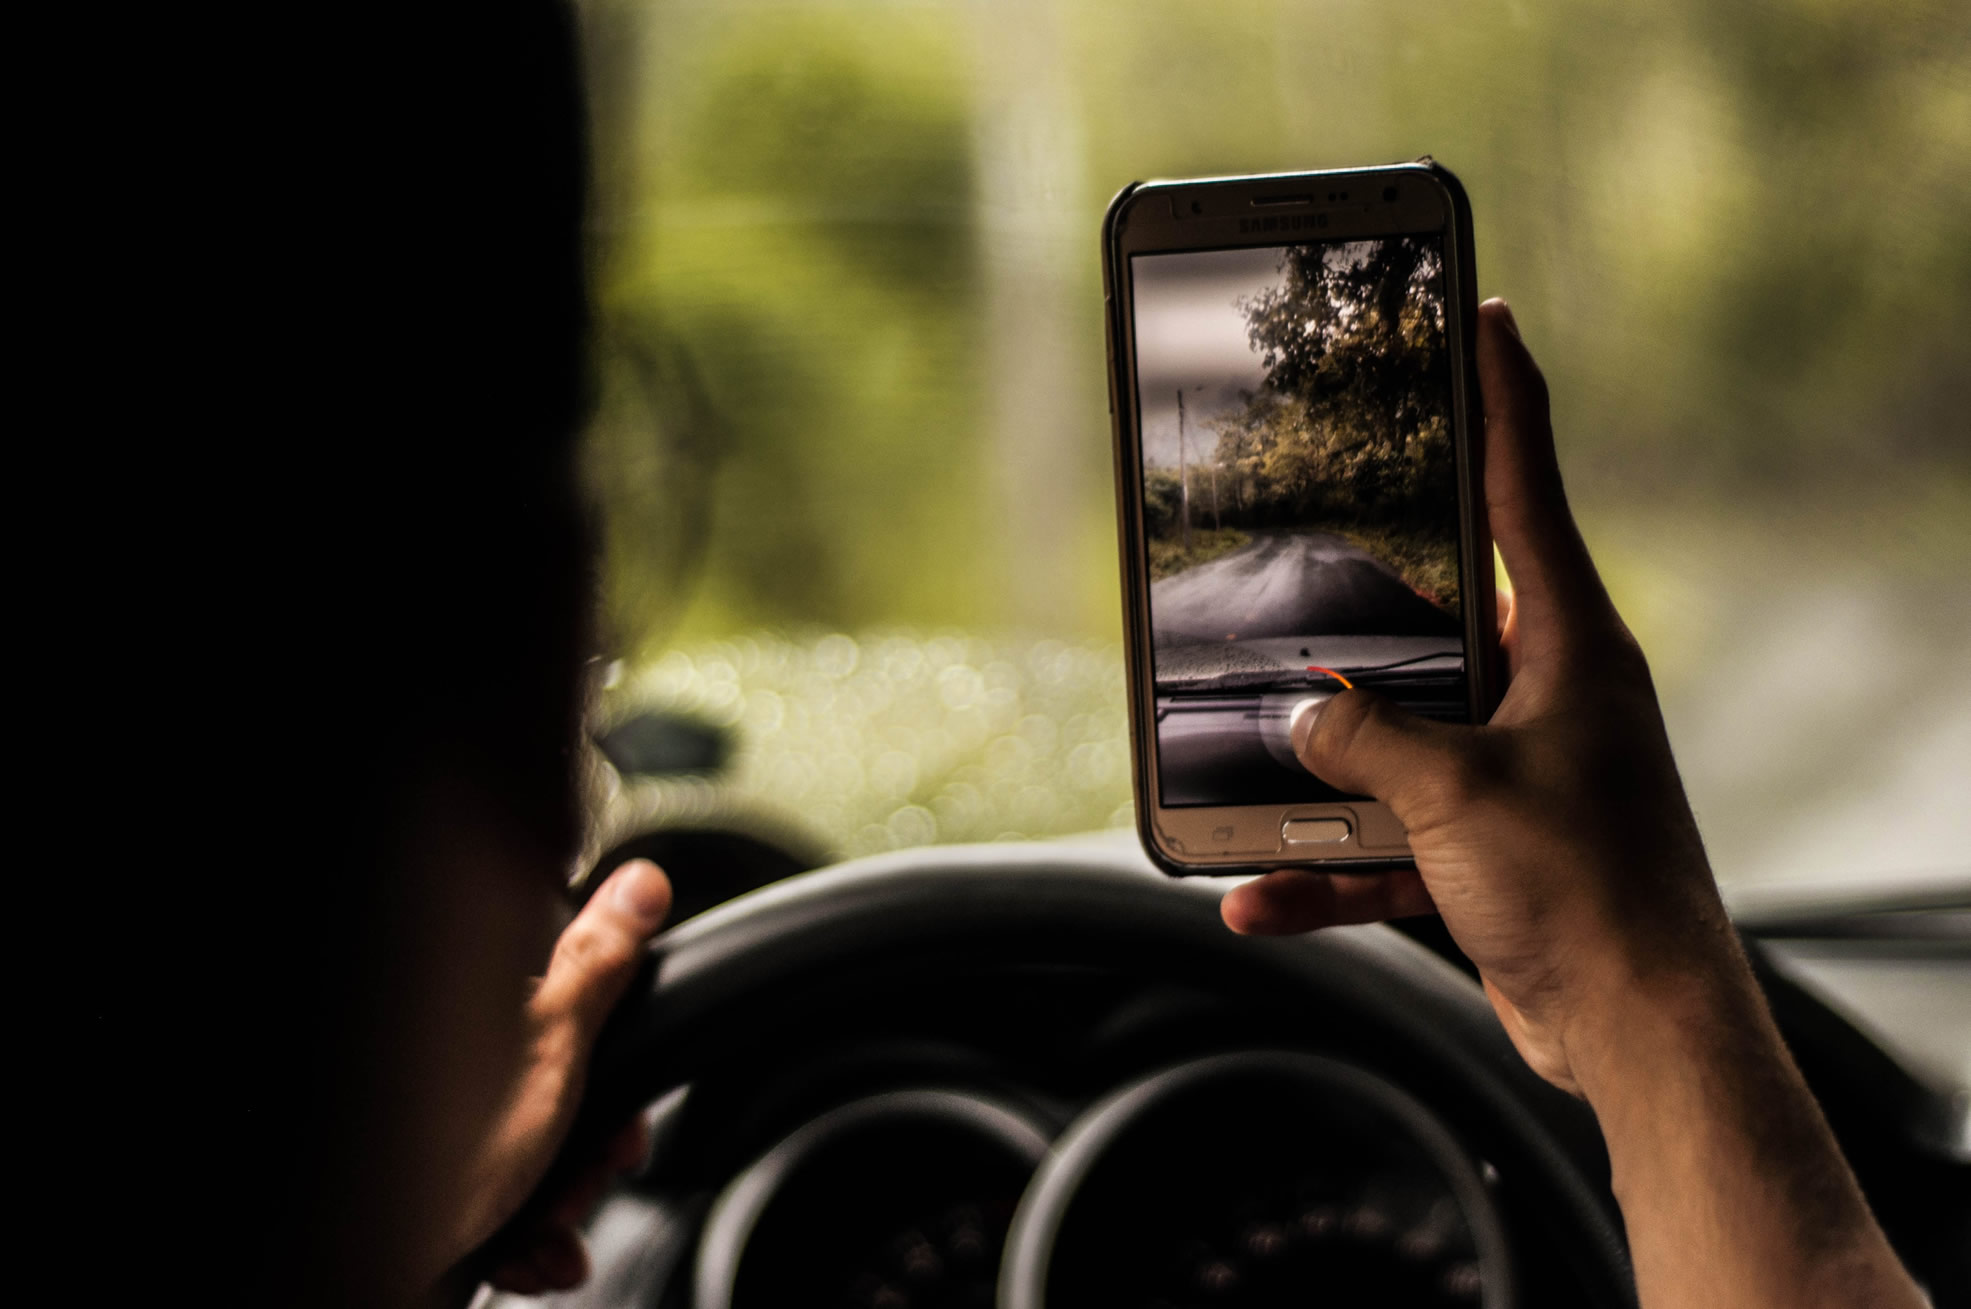 4 signos de que eres adicto a tu teléfono celular y 4 maneras de recuperarte